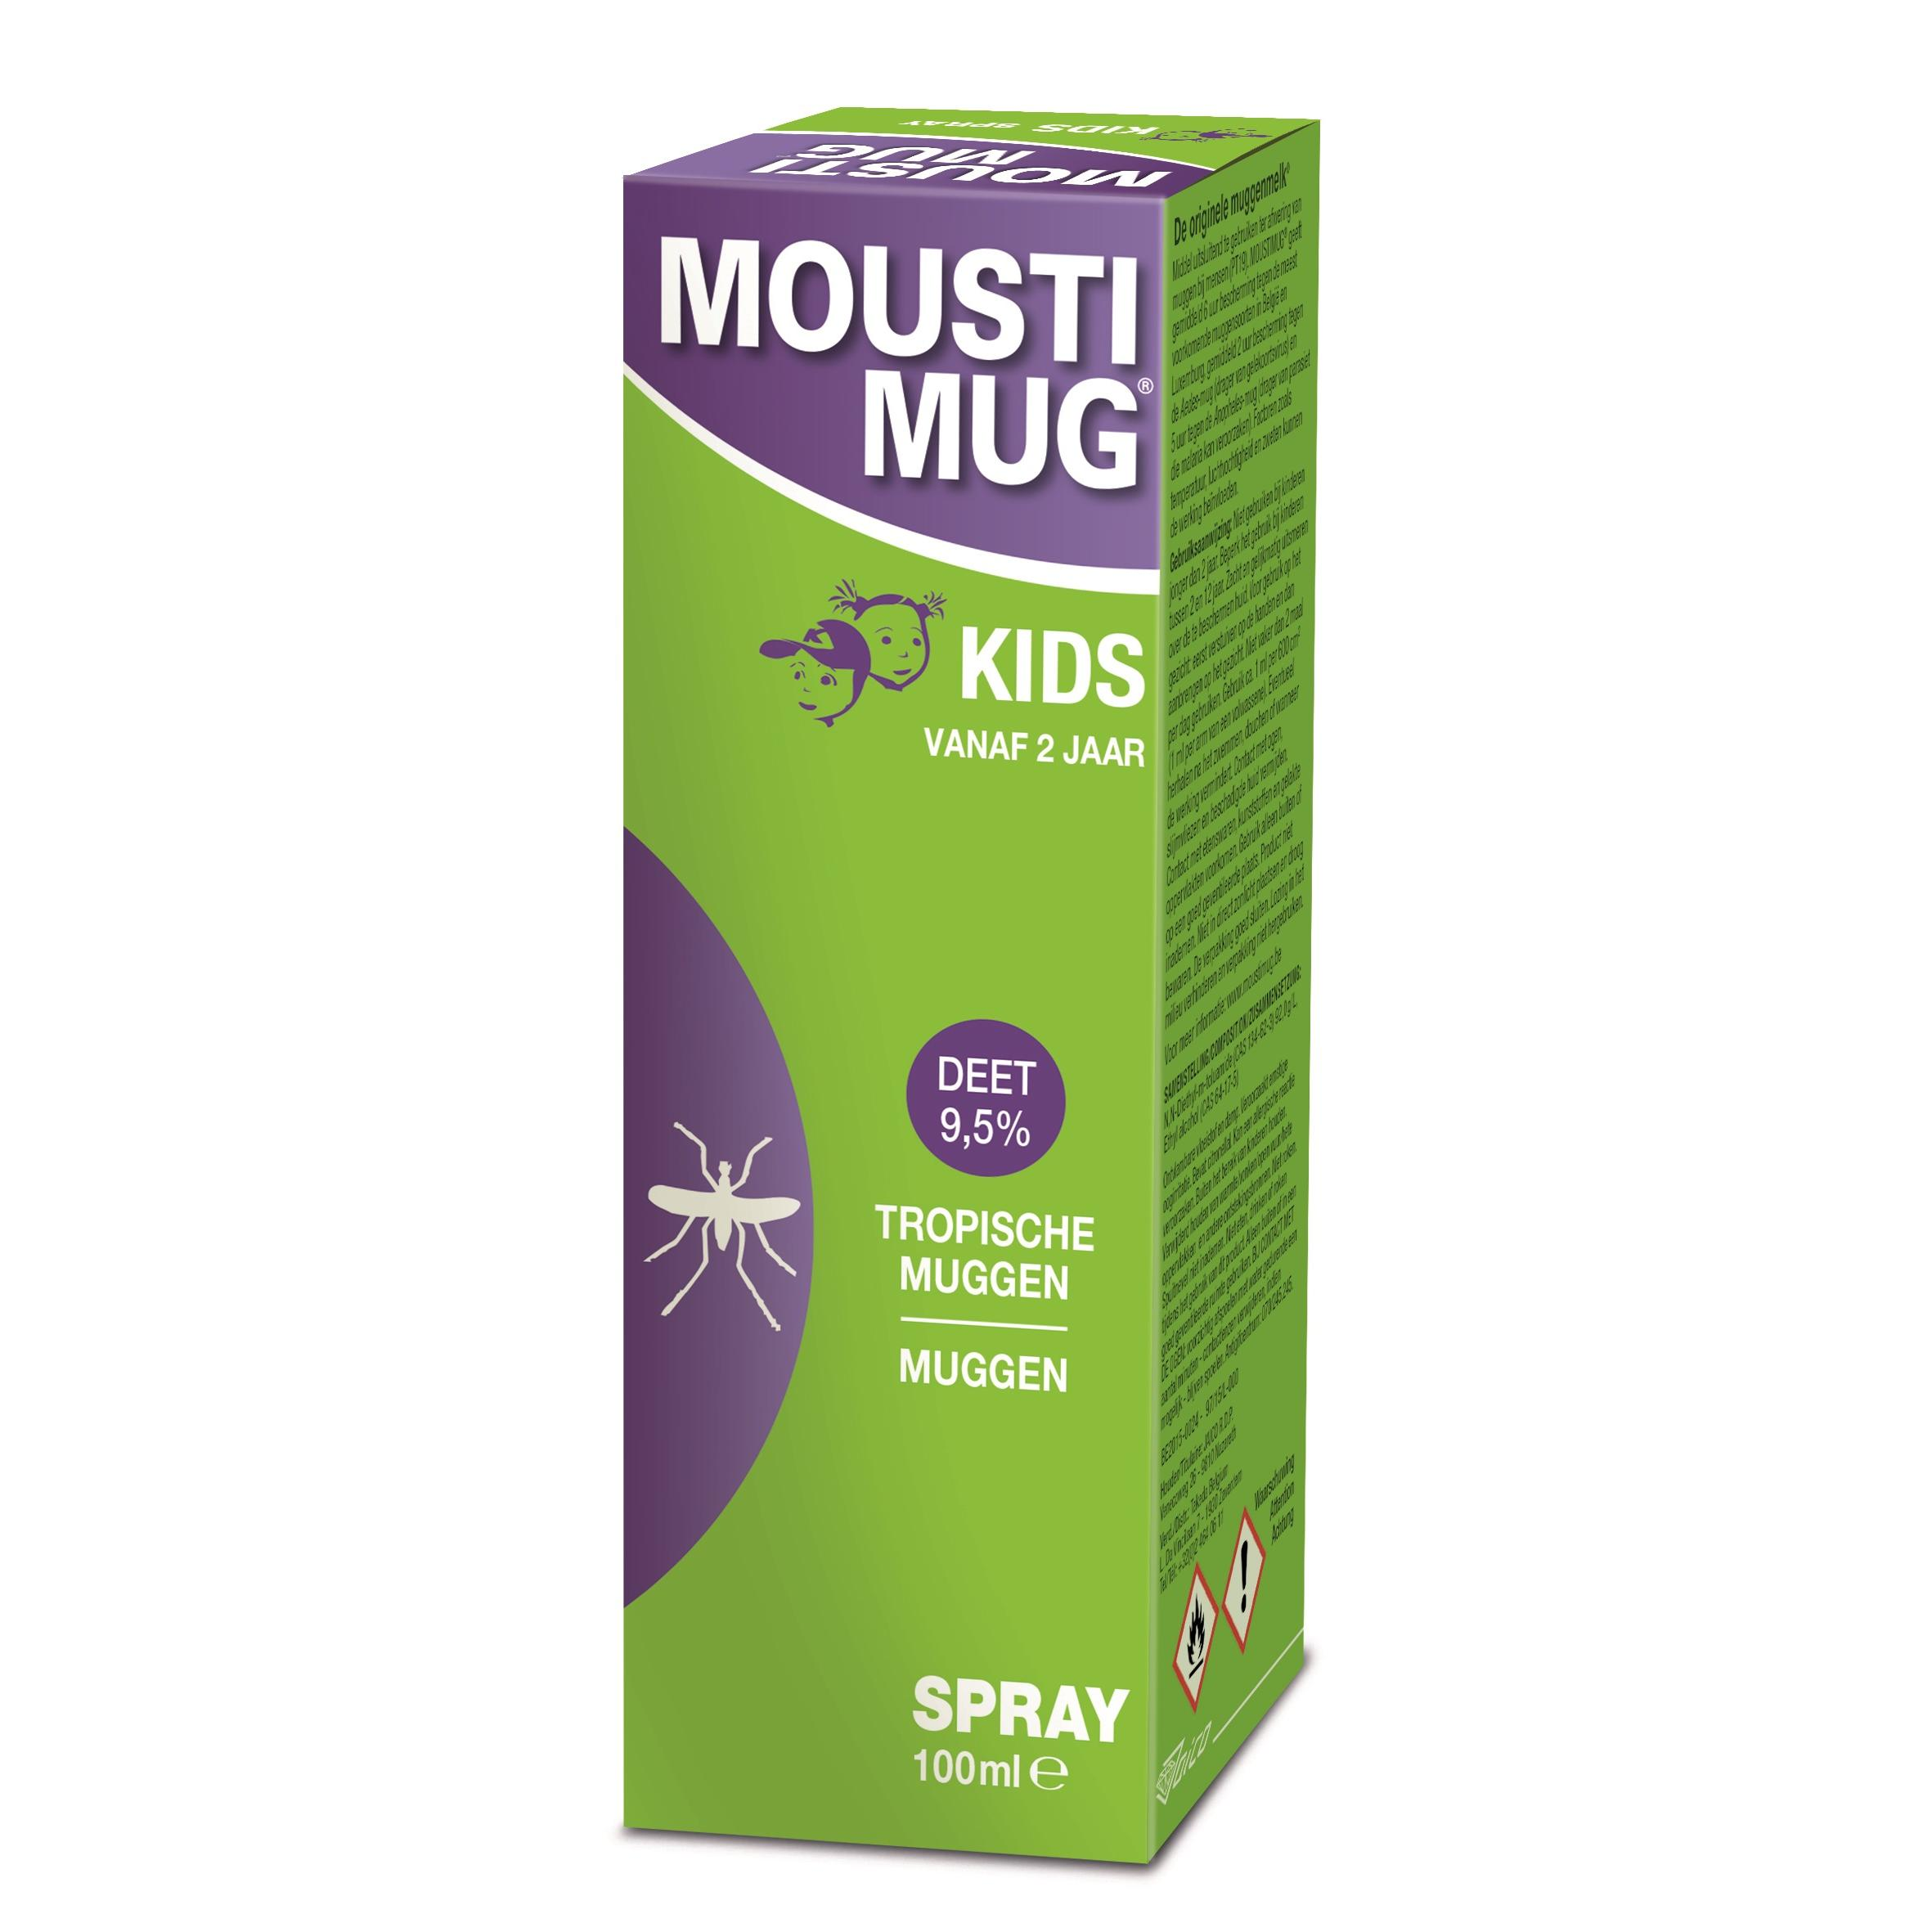 Image of Moustimug spray 9,5% DEET